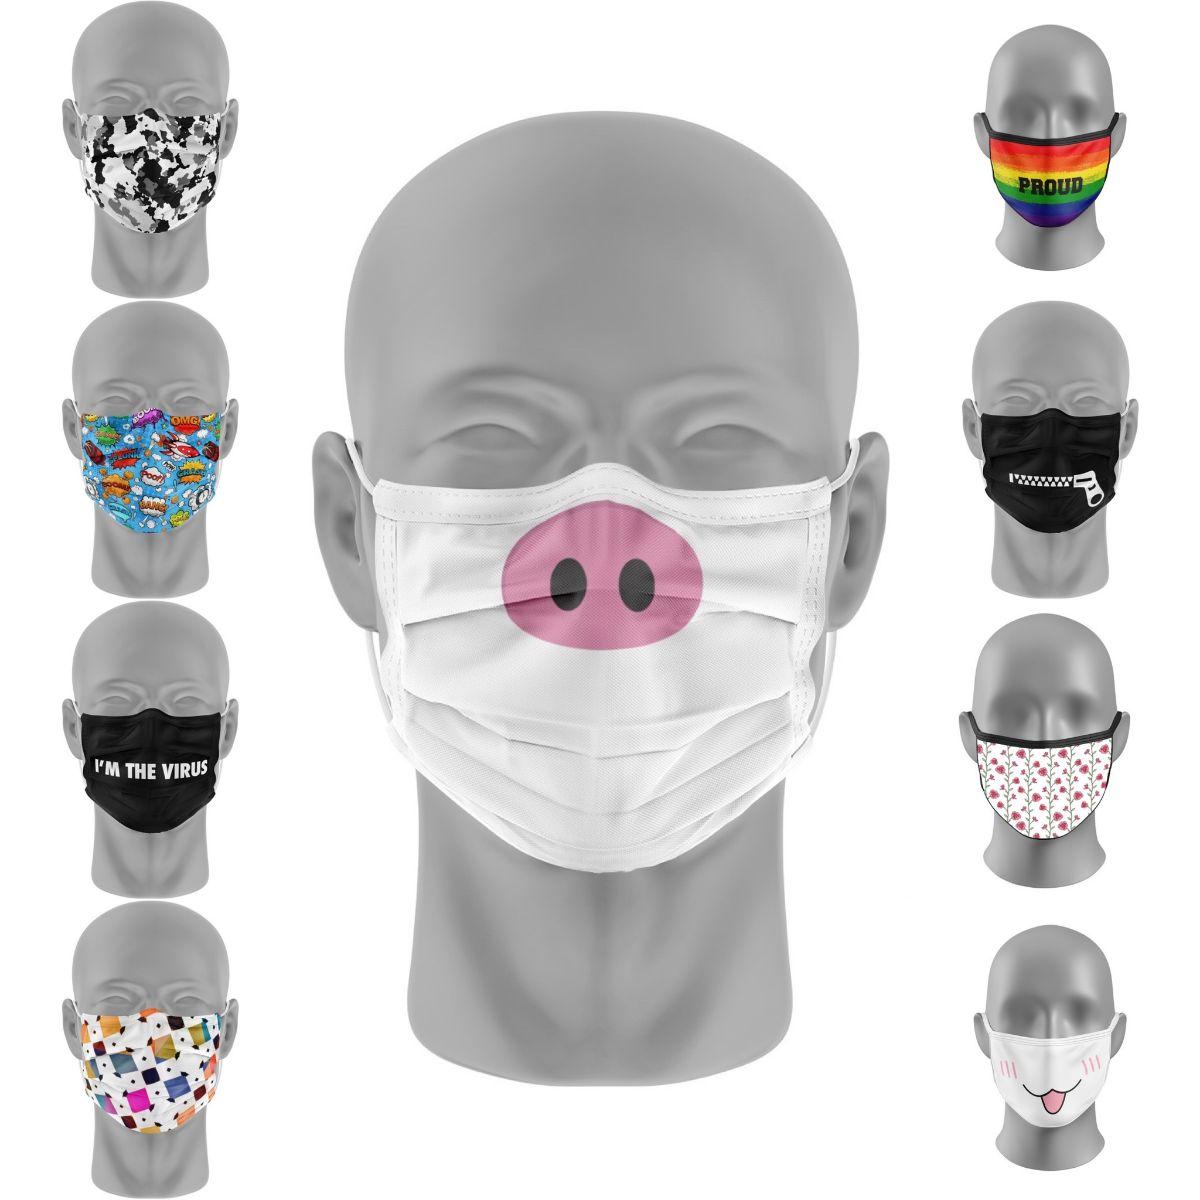 Creëer je eigen herbruikbare (mond)maskers incl. UPDATE